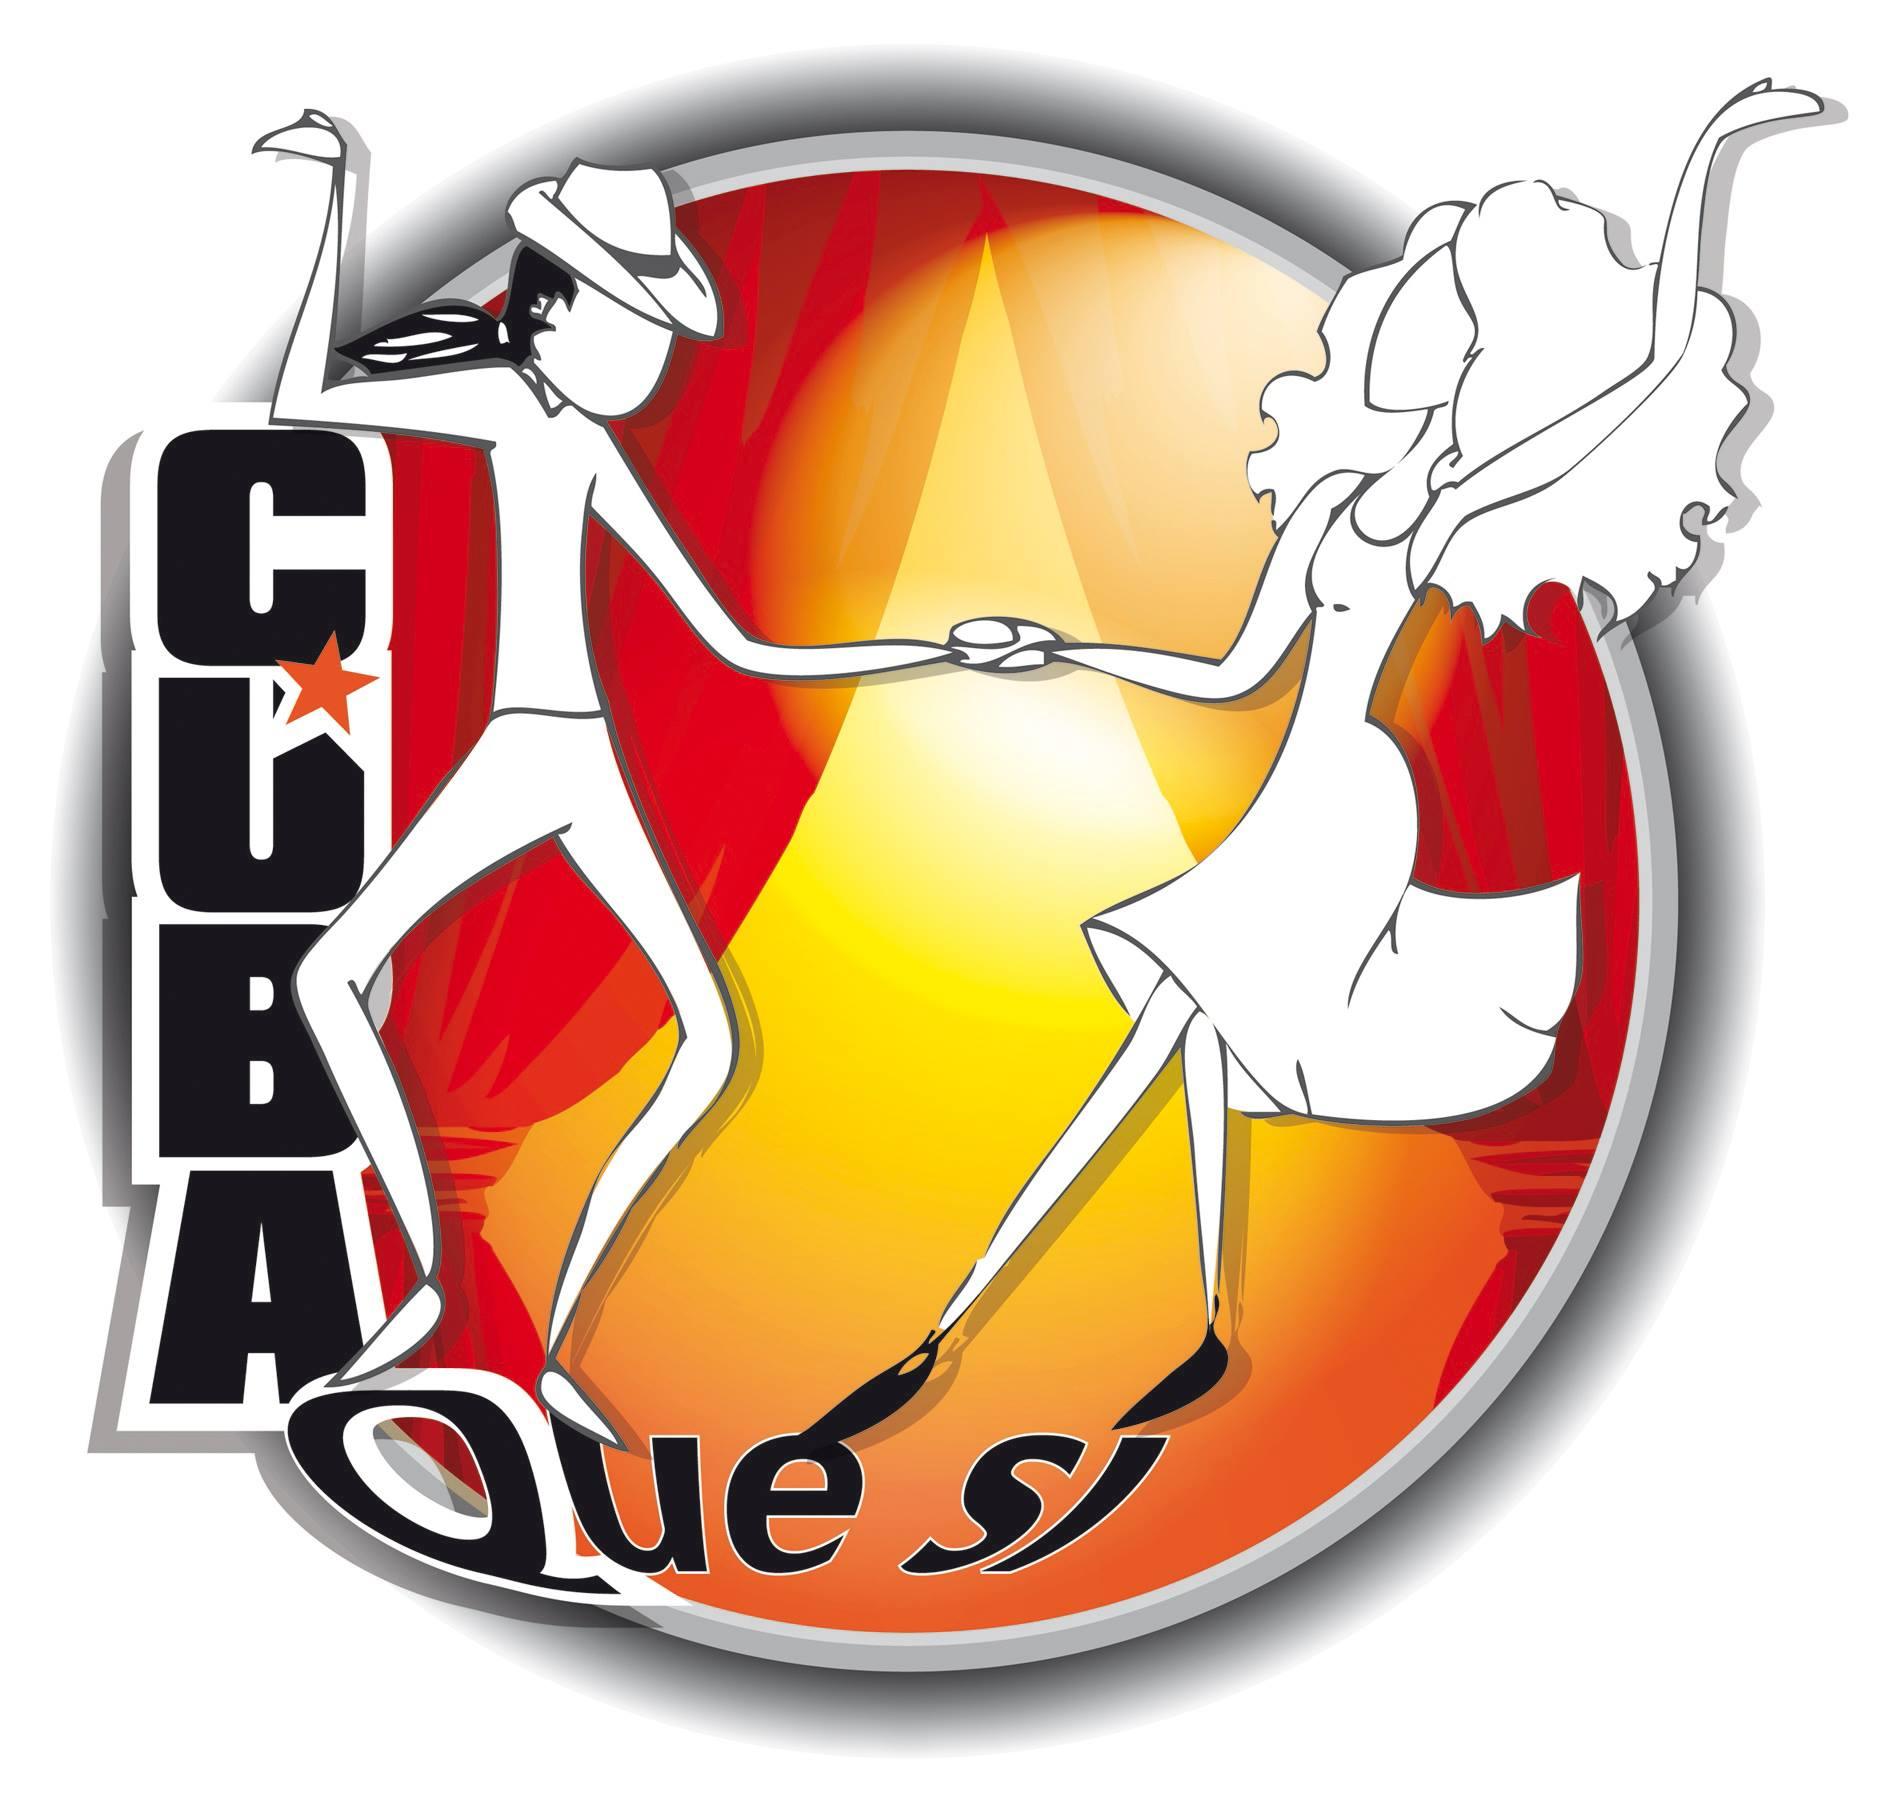 Cuba Que Si